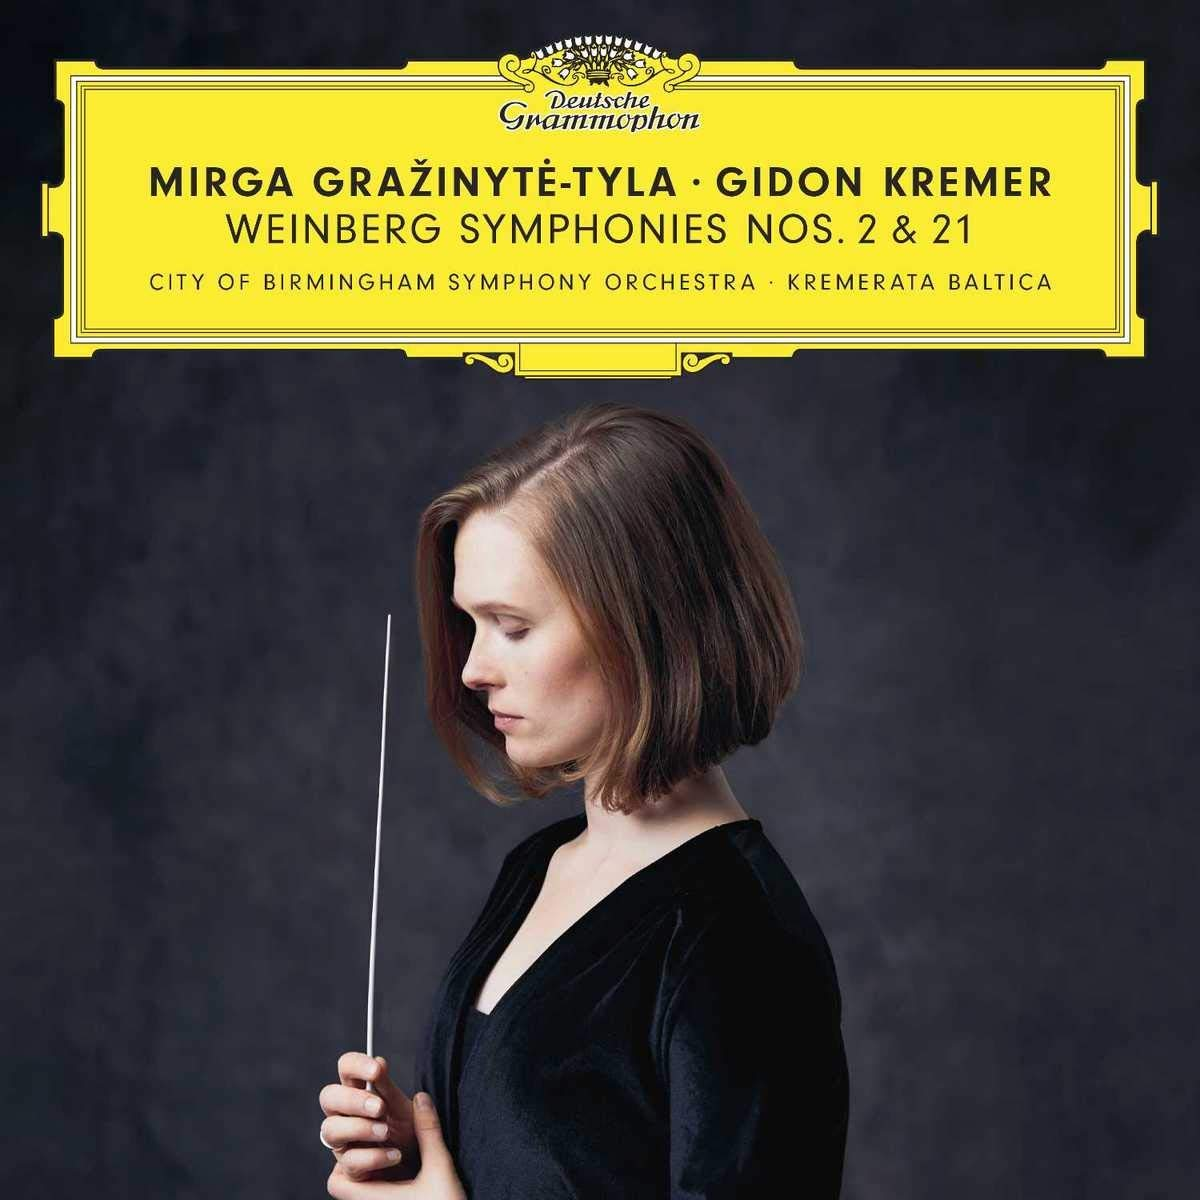 Mirga Grazinyte-Tyla. Weinberg: Symphonies Nos. 2 & 21 (2 CD)